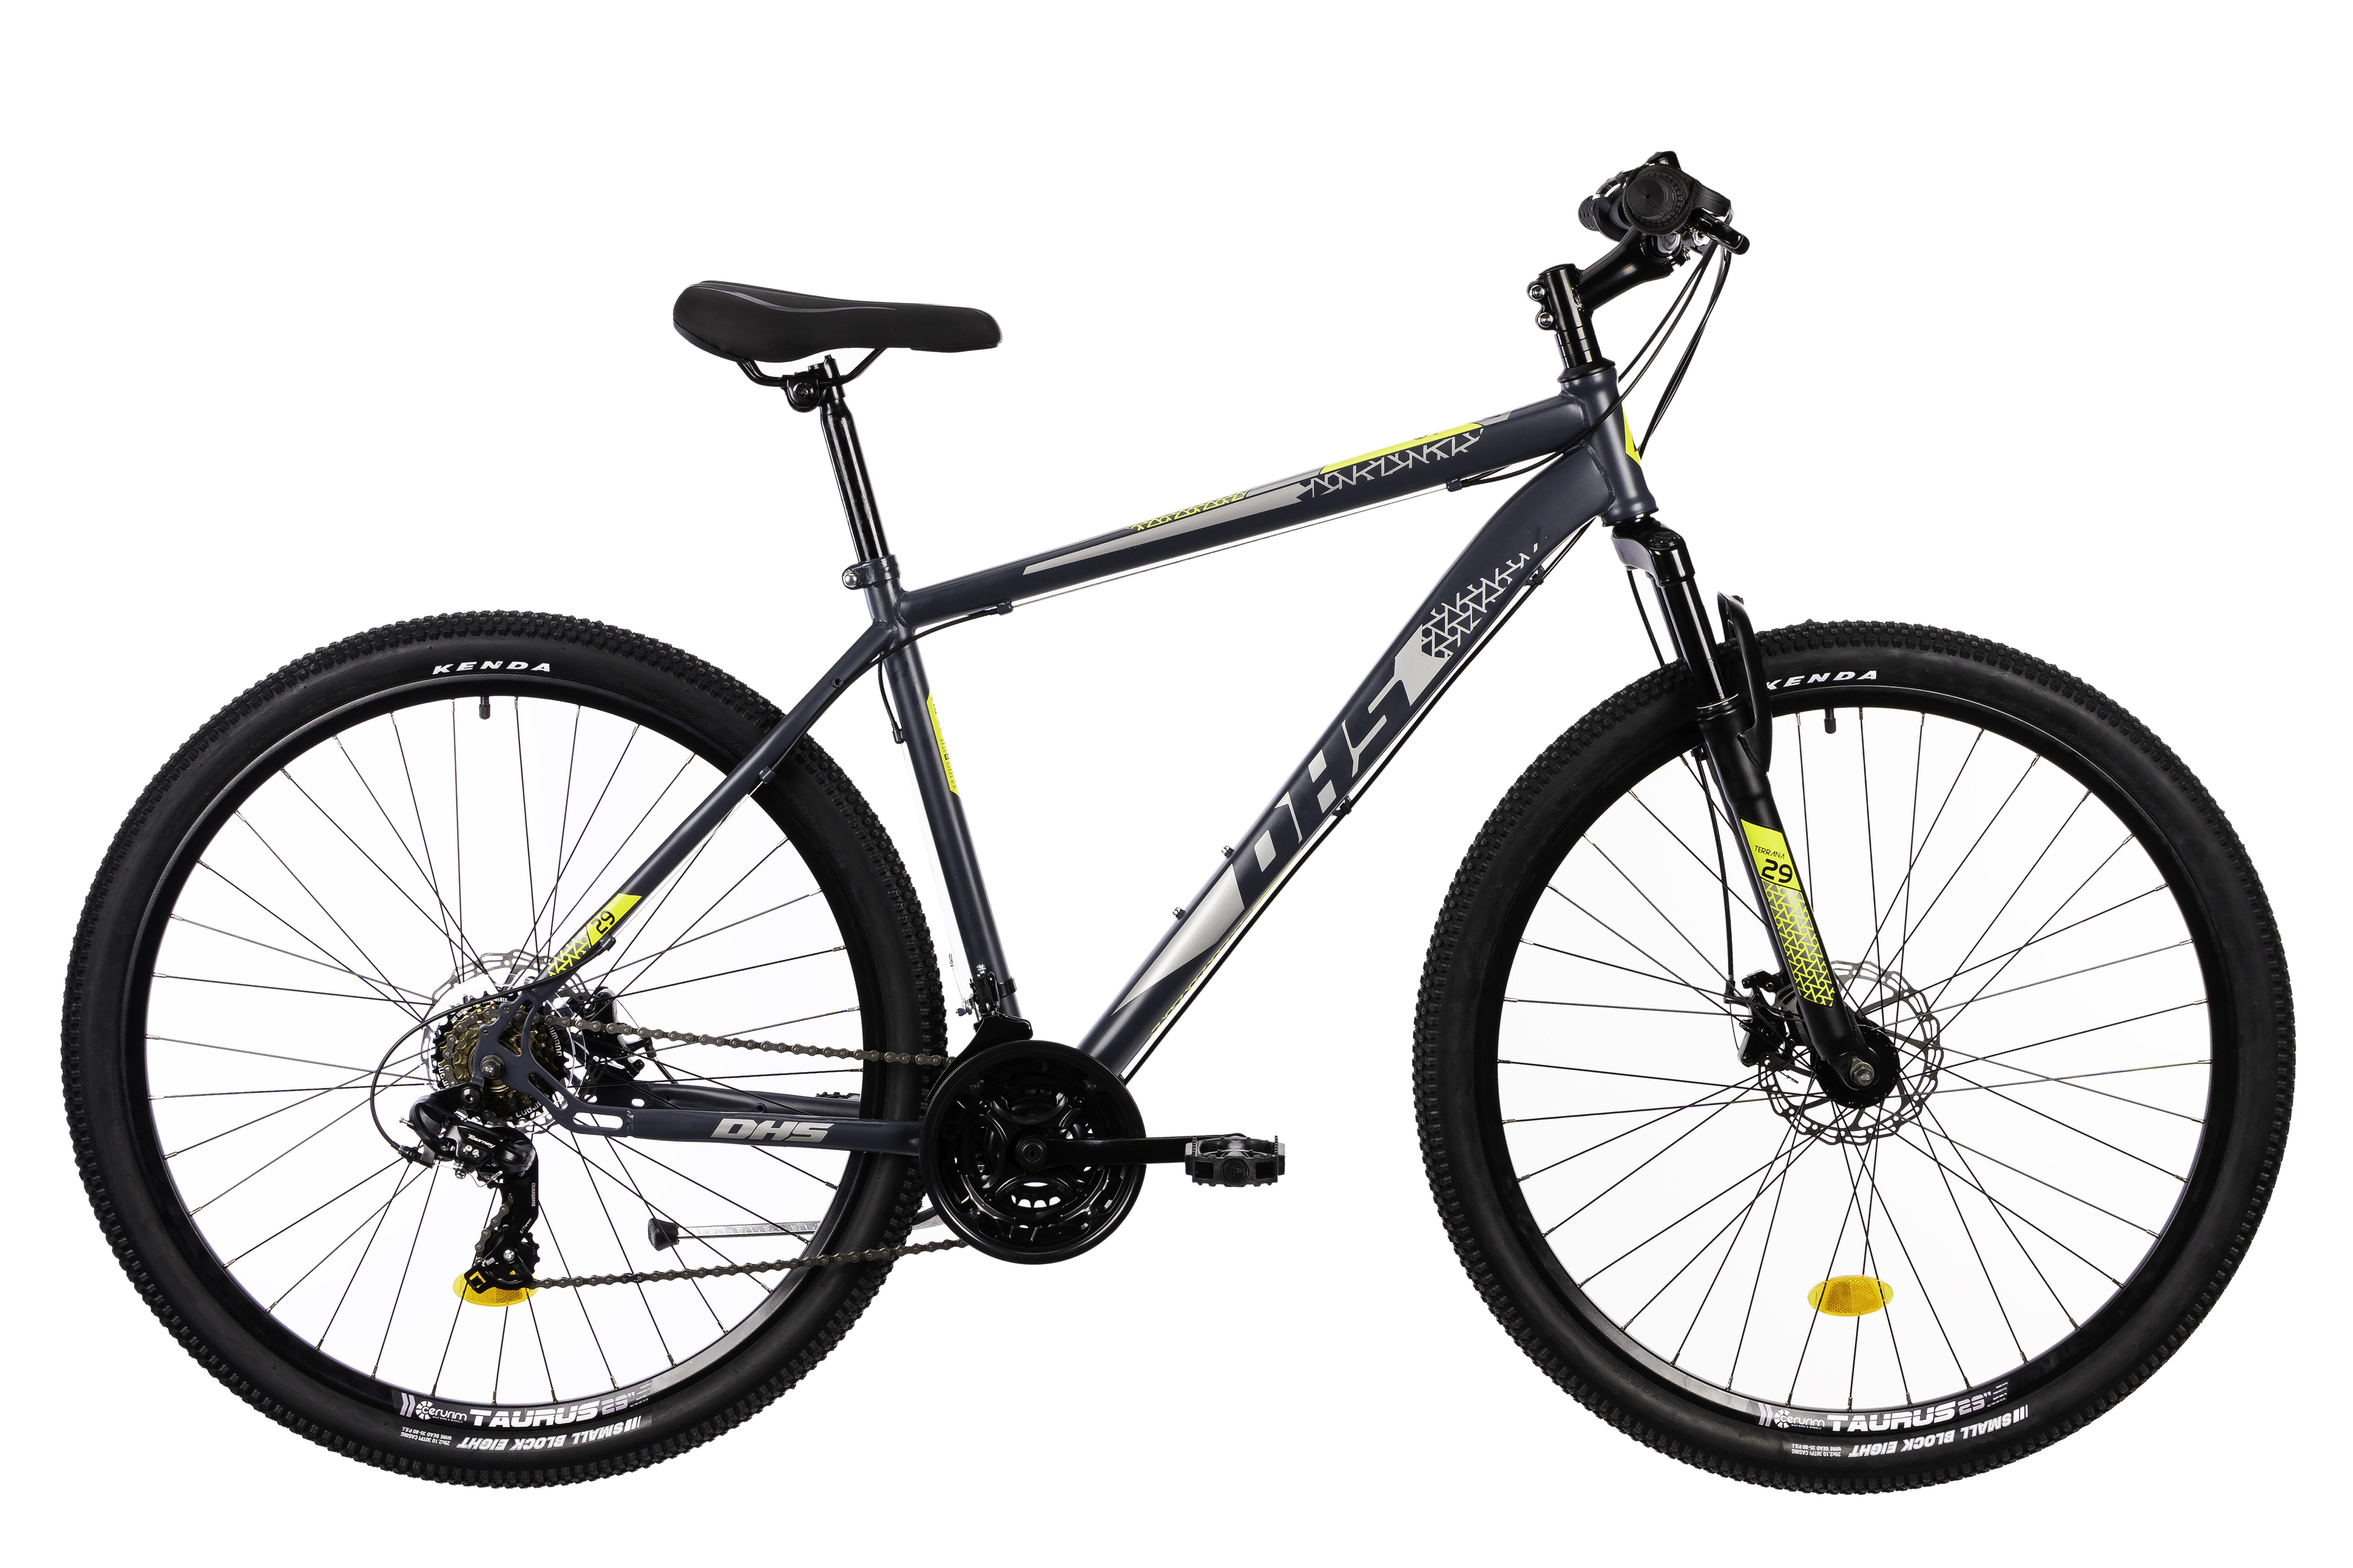 Bicicleta Mtb Terrana 2905 - 29 Inch, M, Gri [7]